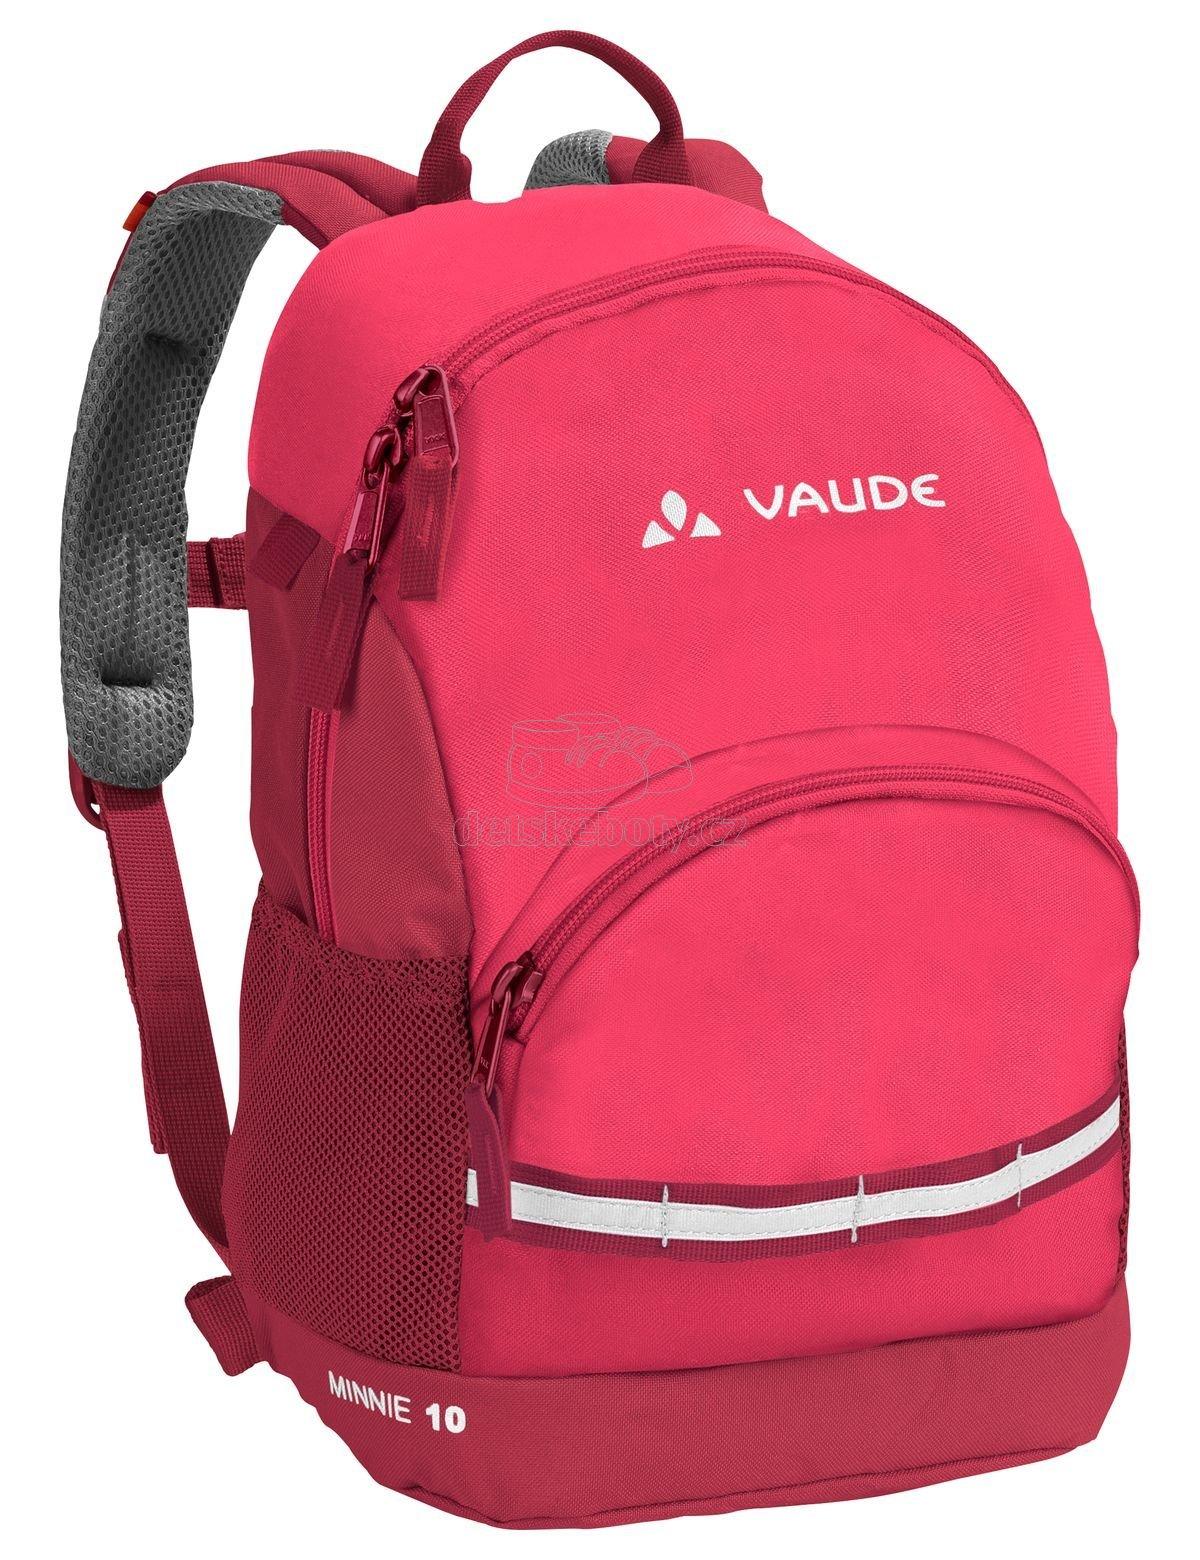 Vaude Minnie 10 bright pink